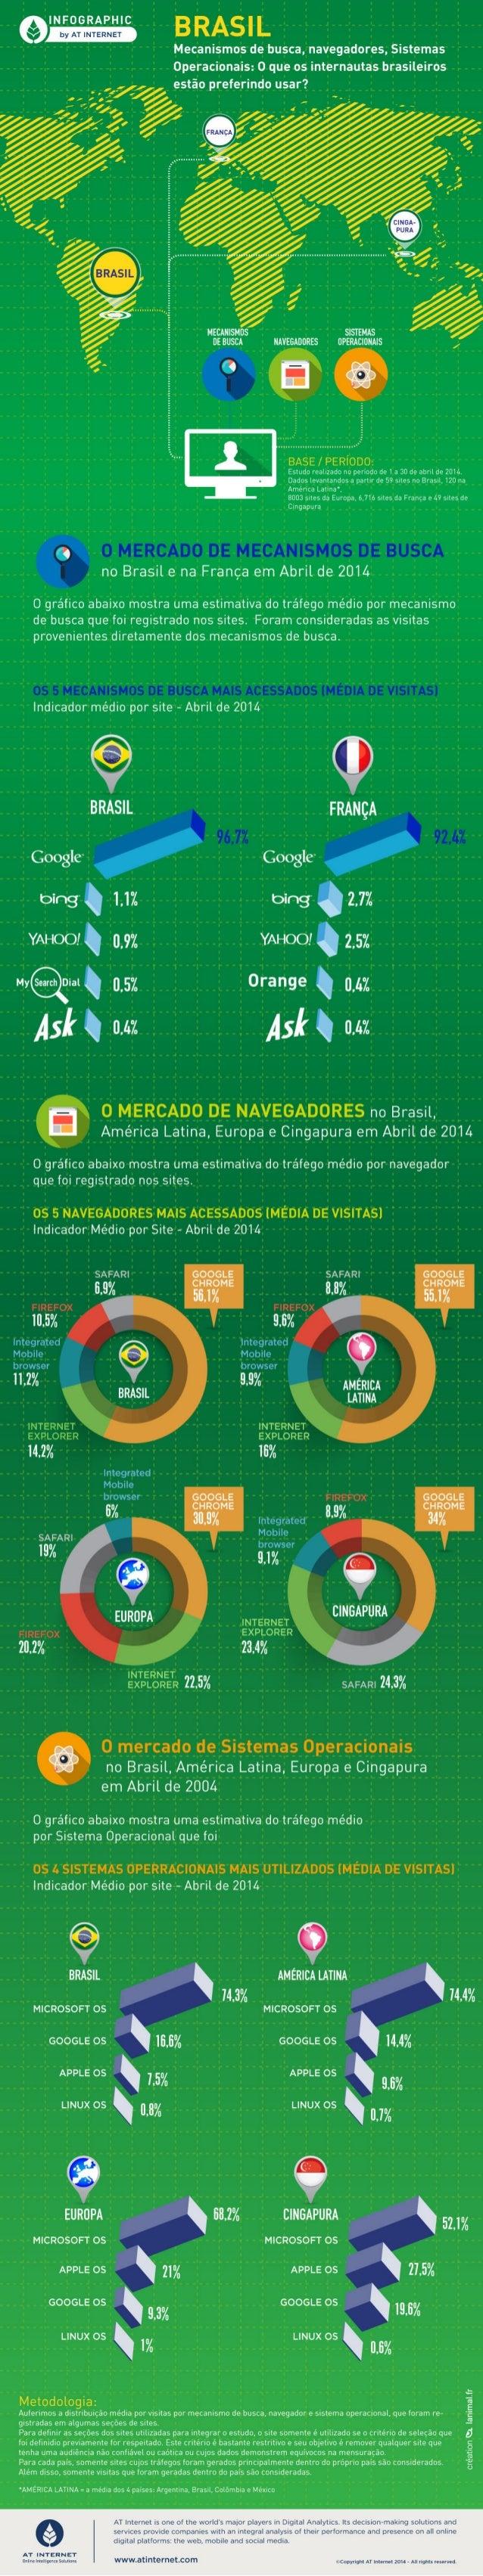 [Infográfico - Abril de 2014] Brasil: Mecanismos de busca, navegadores, Sistemas Operacionais